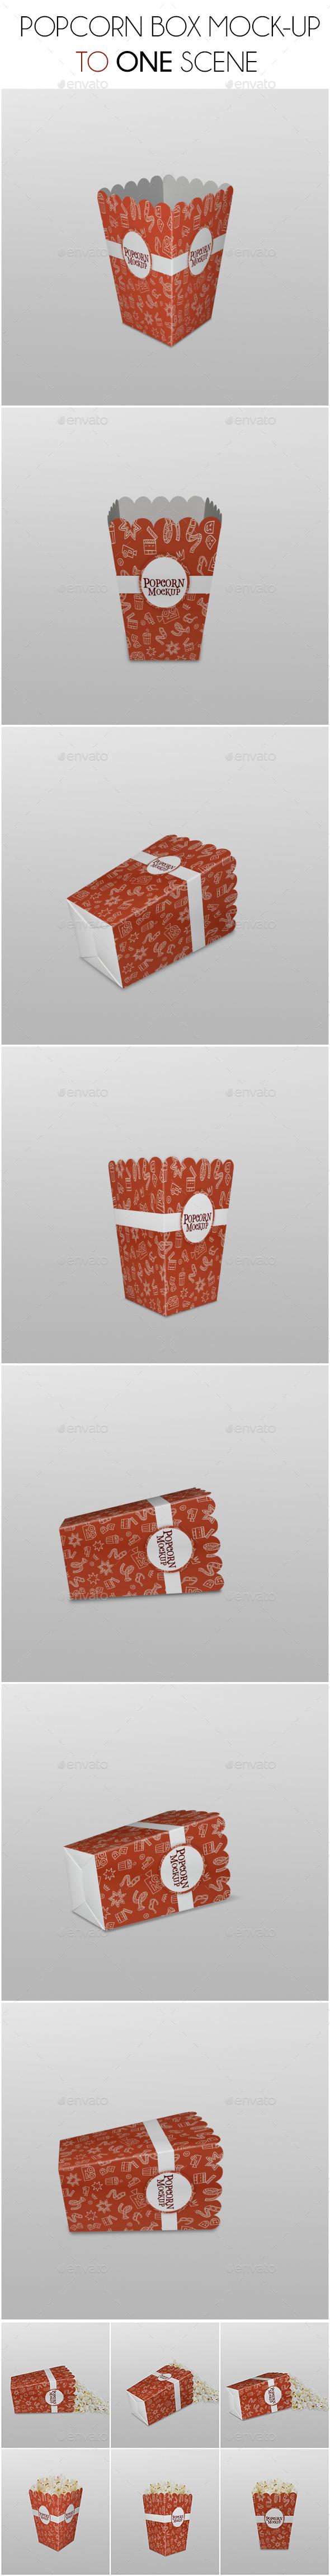 Popcorn Box Mockup - Product Mock-Ups Graphics